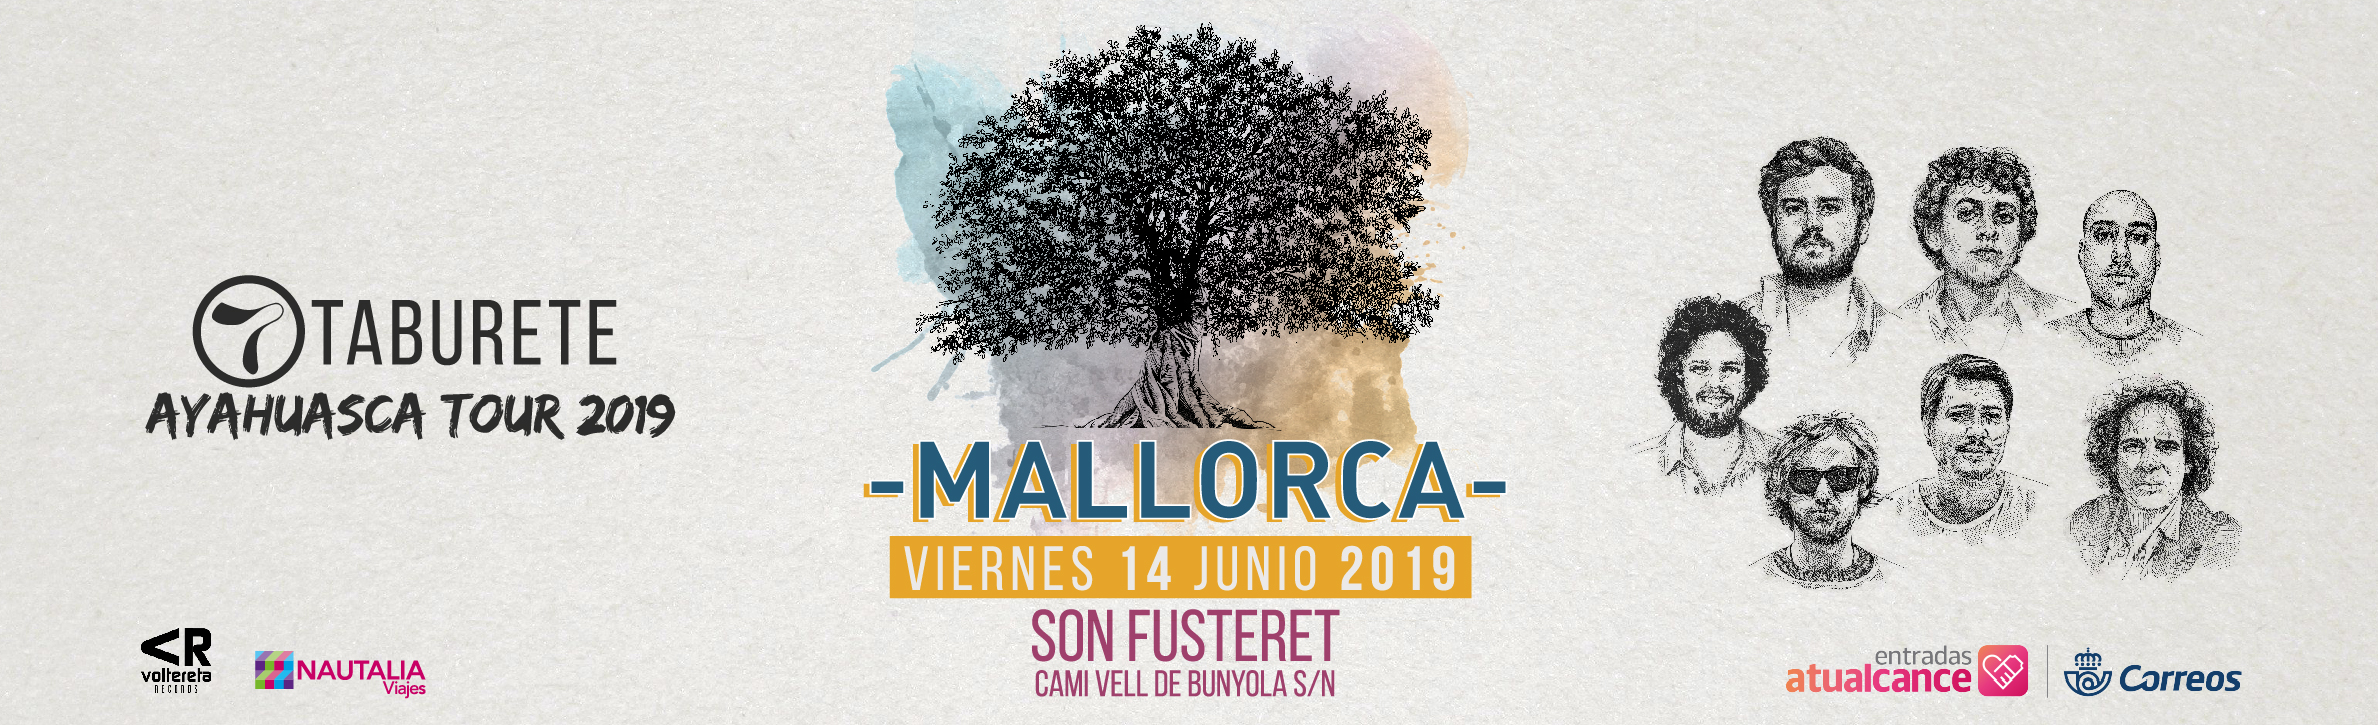 taburete-ayahuasca-tour-mallorca-14-juni